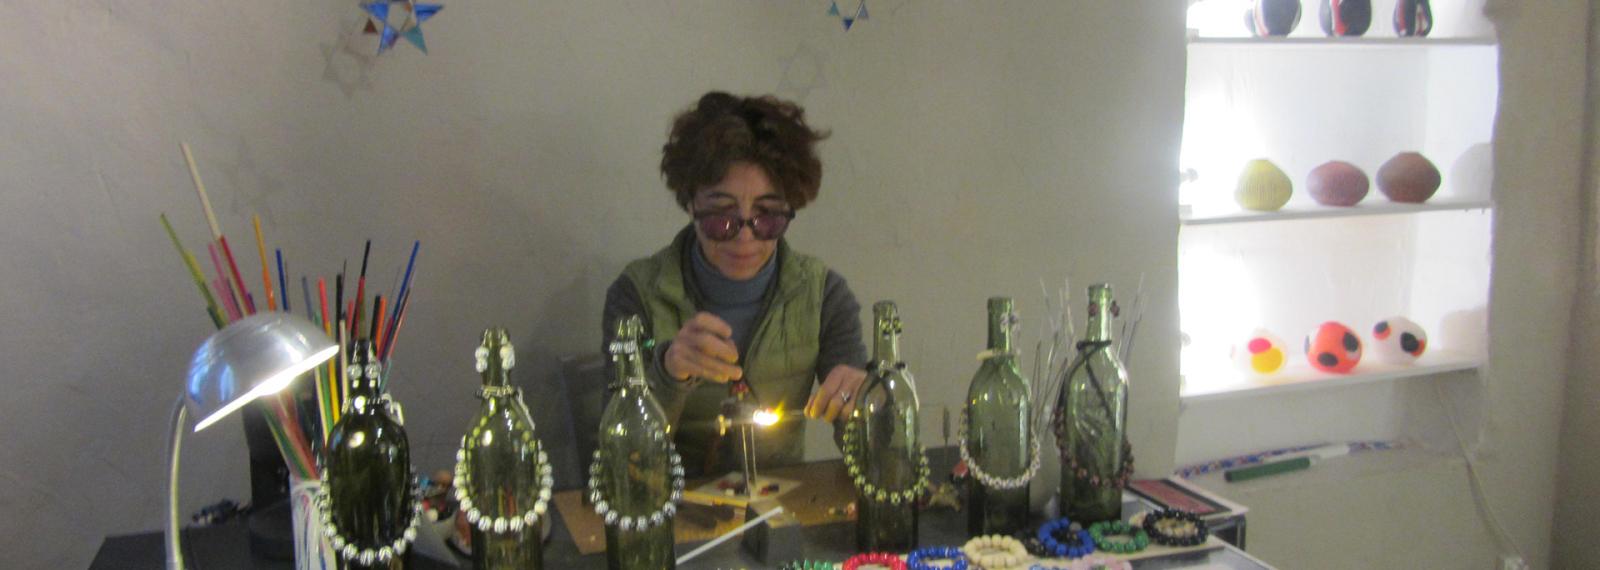 Atelier du Verre - Mélanie Cornu